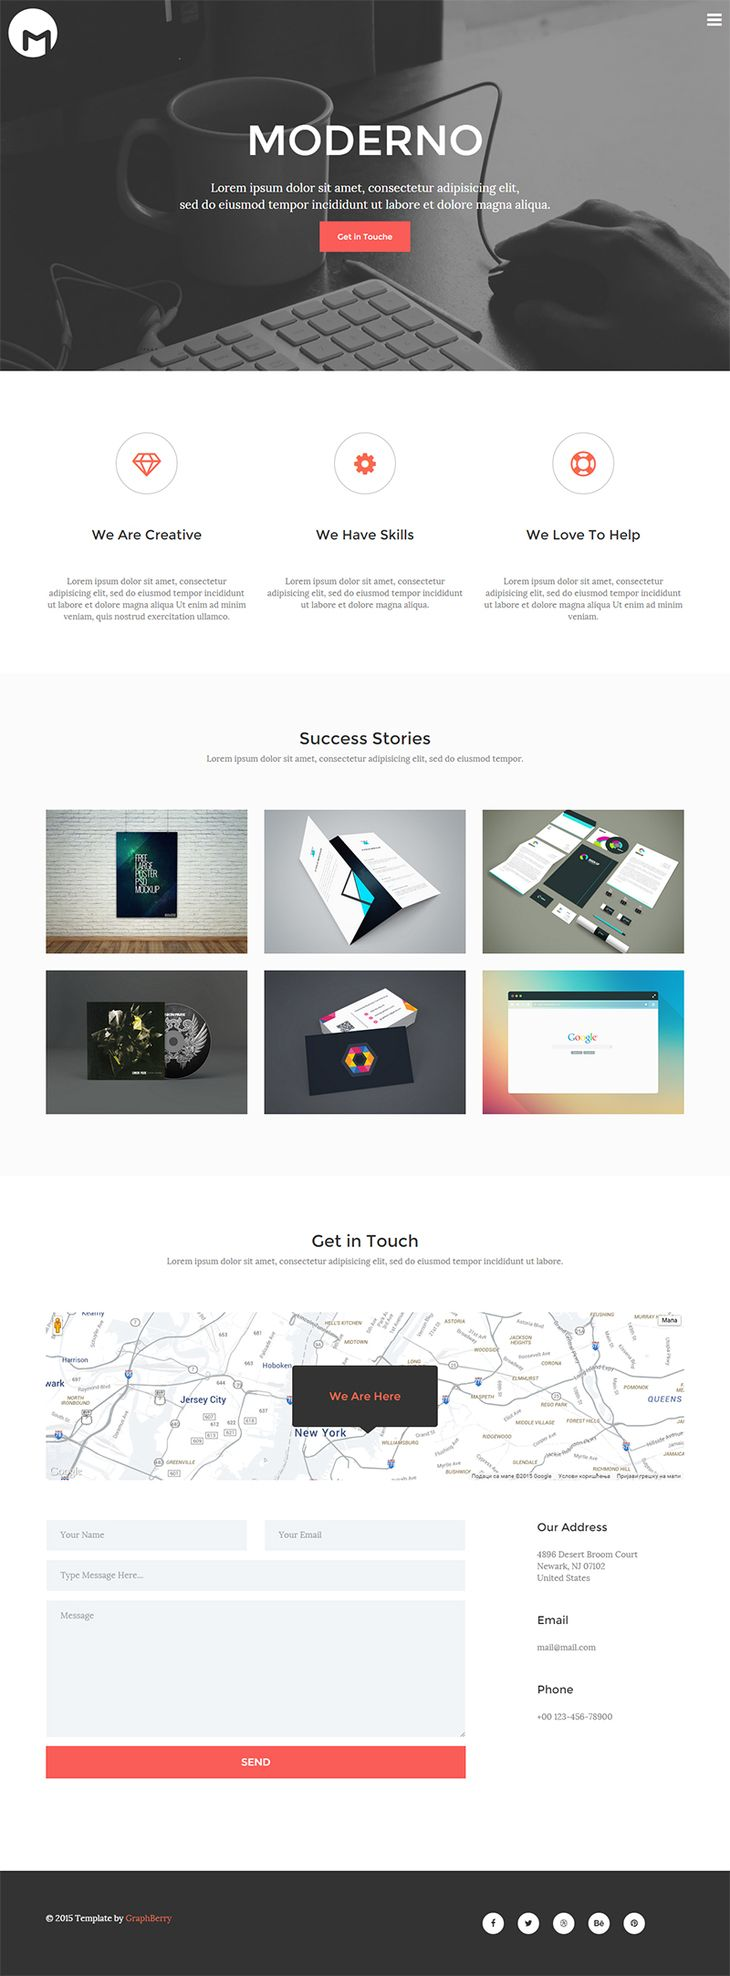 Moderno Free Html5 Responsive Template Portfolio Web Design Simple Web Design Web Design